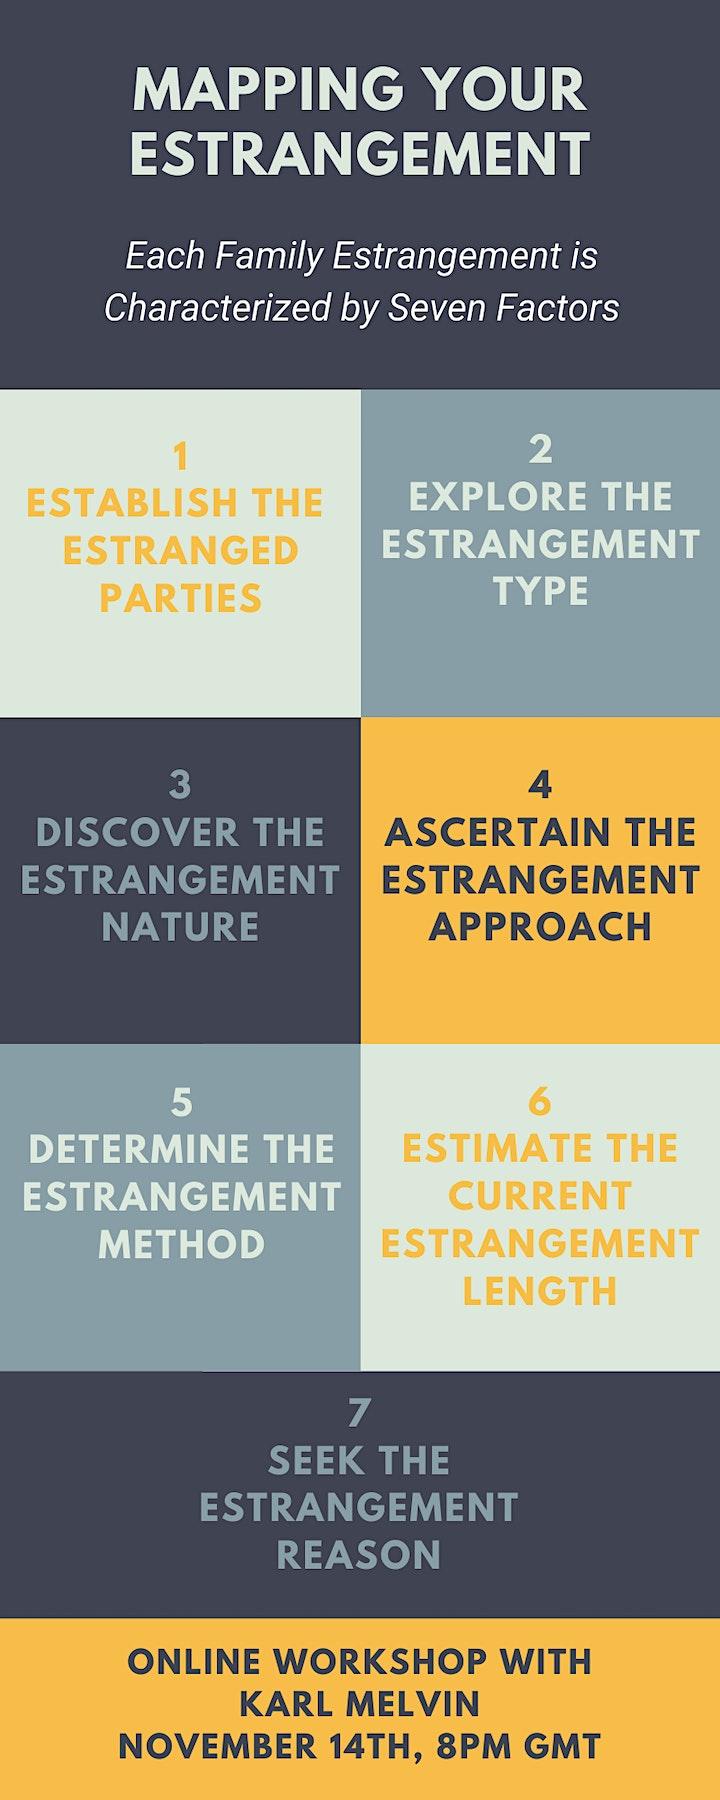 Mapping Your Estrangement: Making Sense of Family Estrangement image